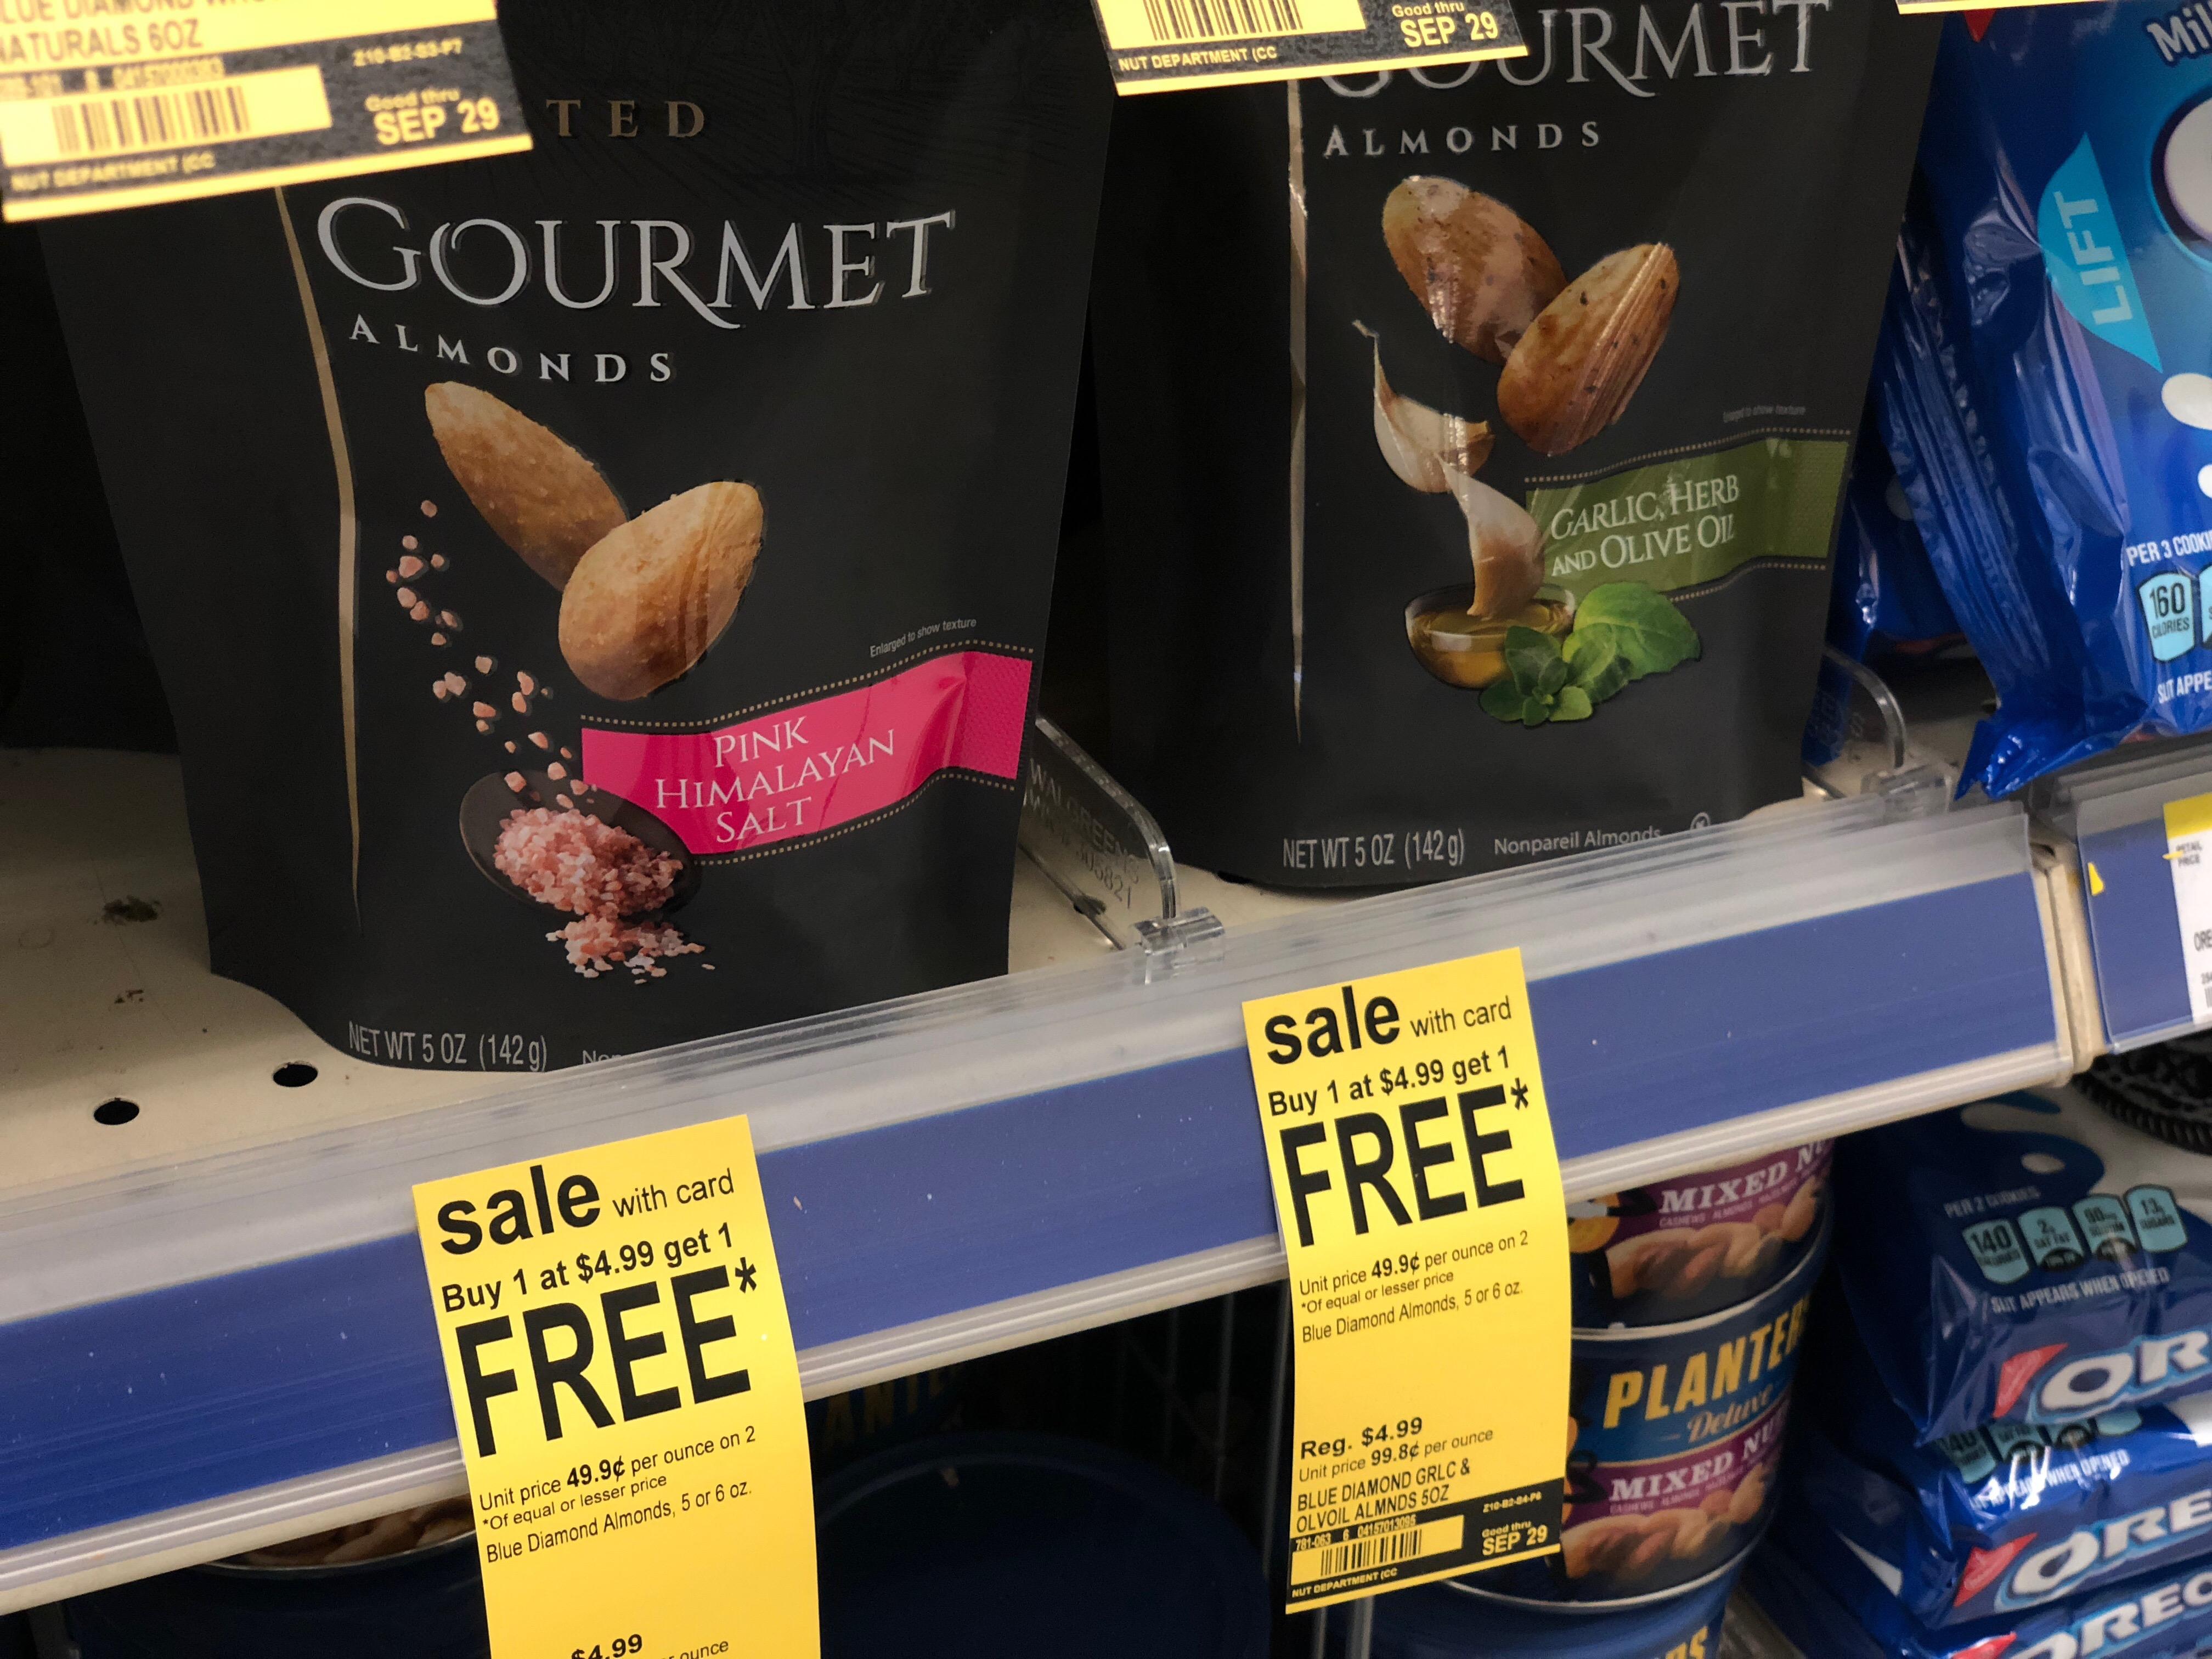 walgreens deal blue diamond almonds – two bags of almonds on the shelf